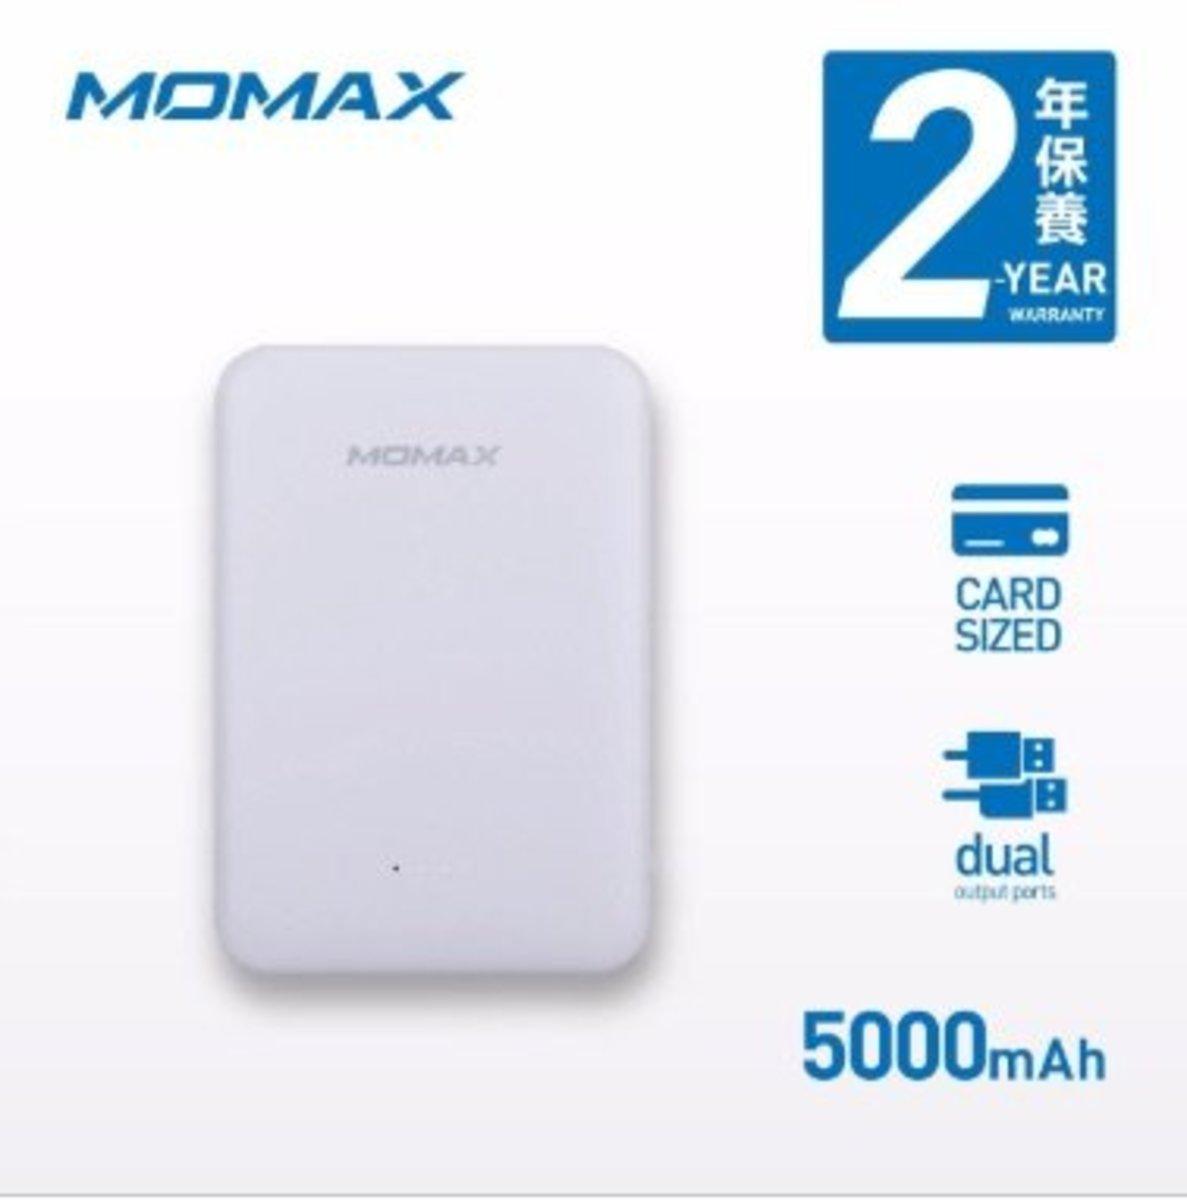 iPower Card 2 External Battery Pack 5000mAh White